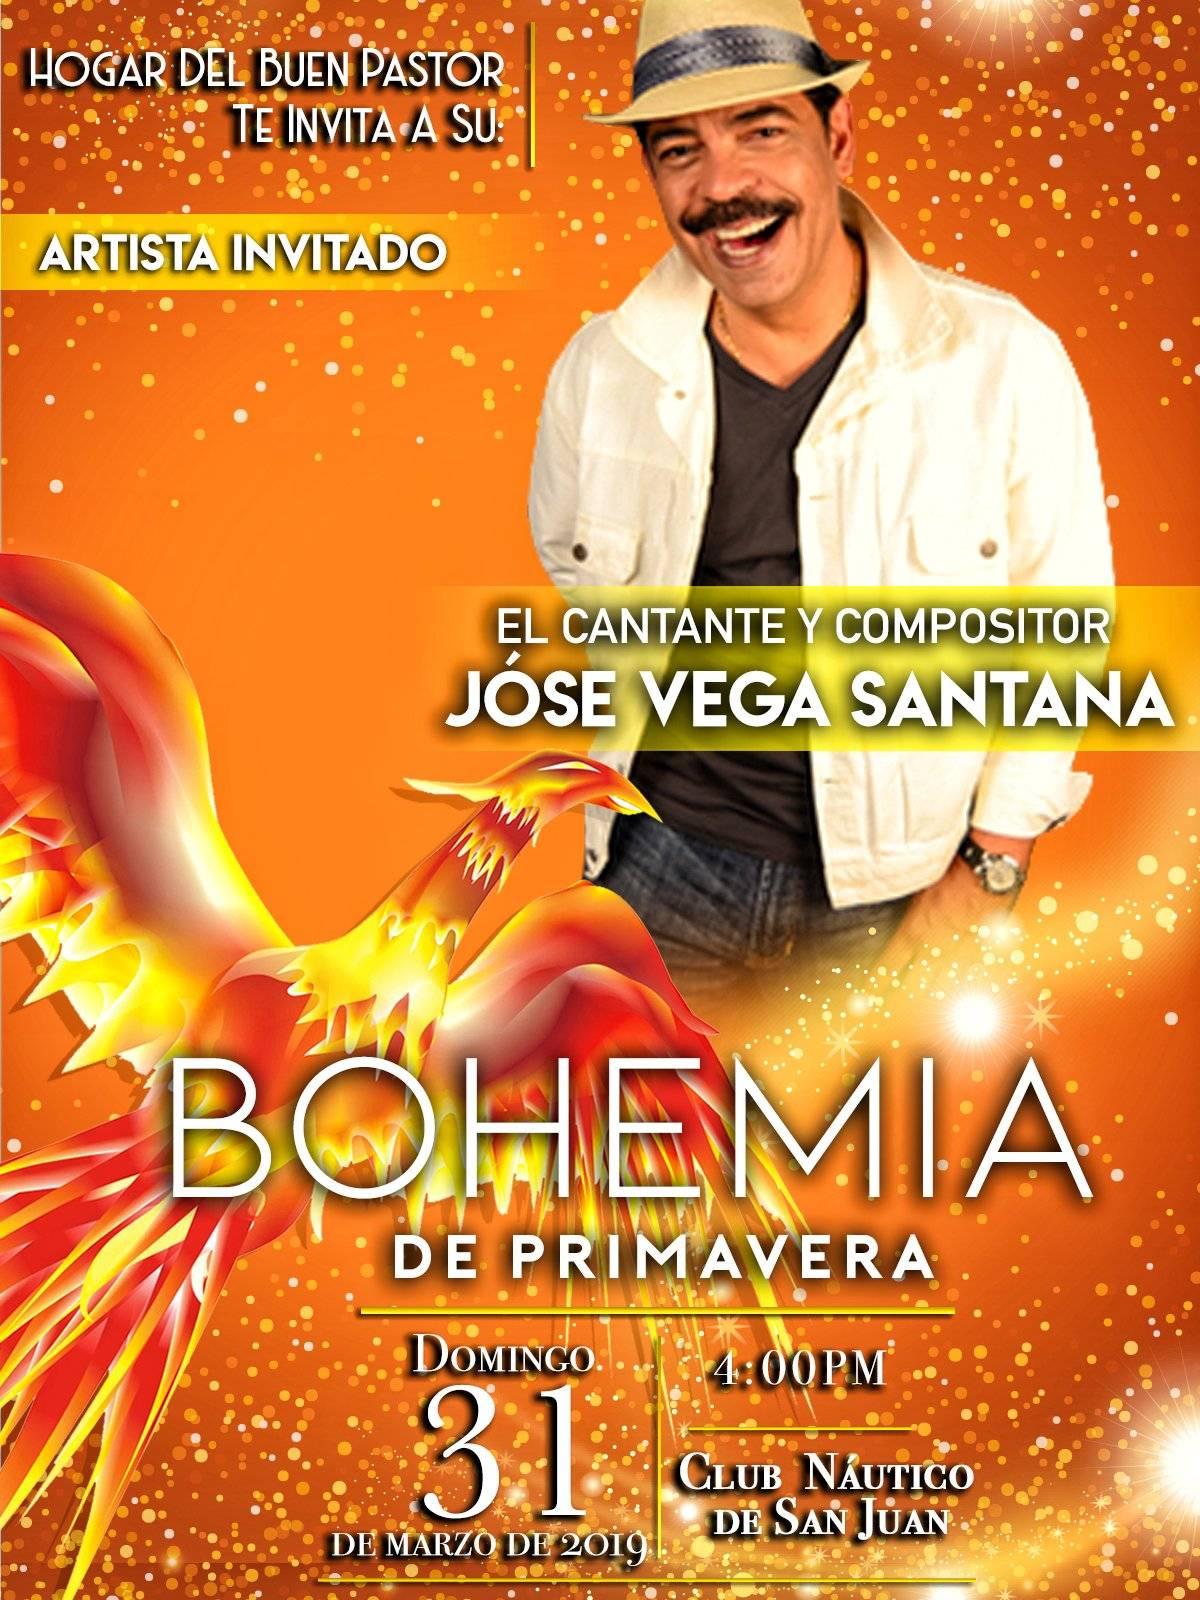 Bohemia Primavera